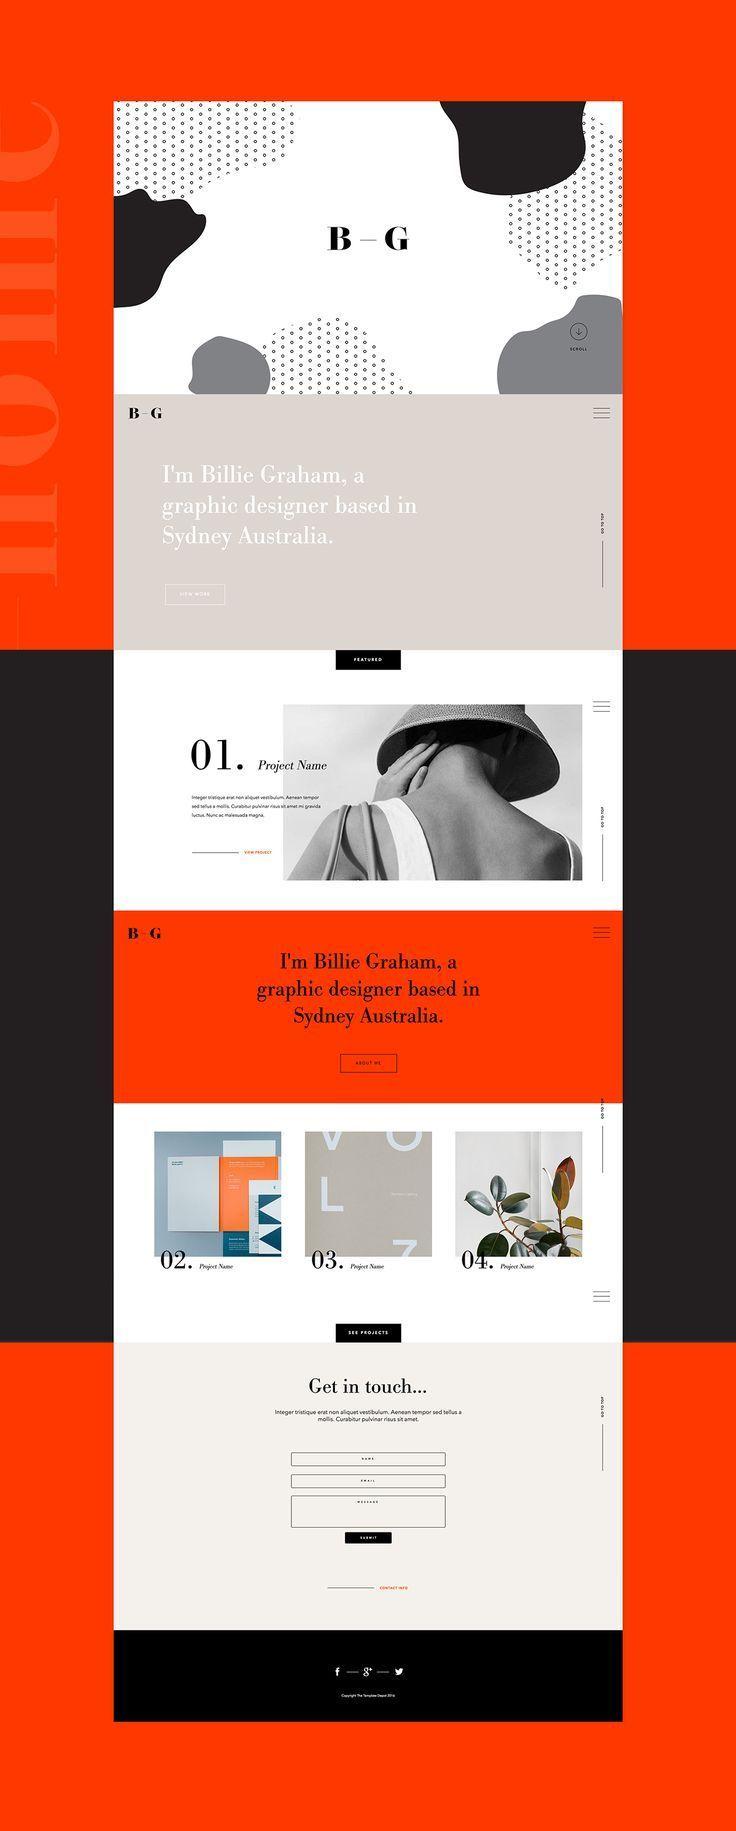 Presentation Design Ideas, Simple design layout